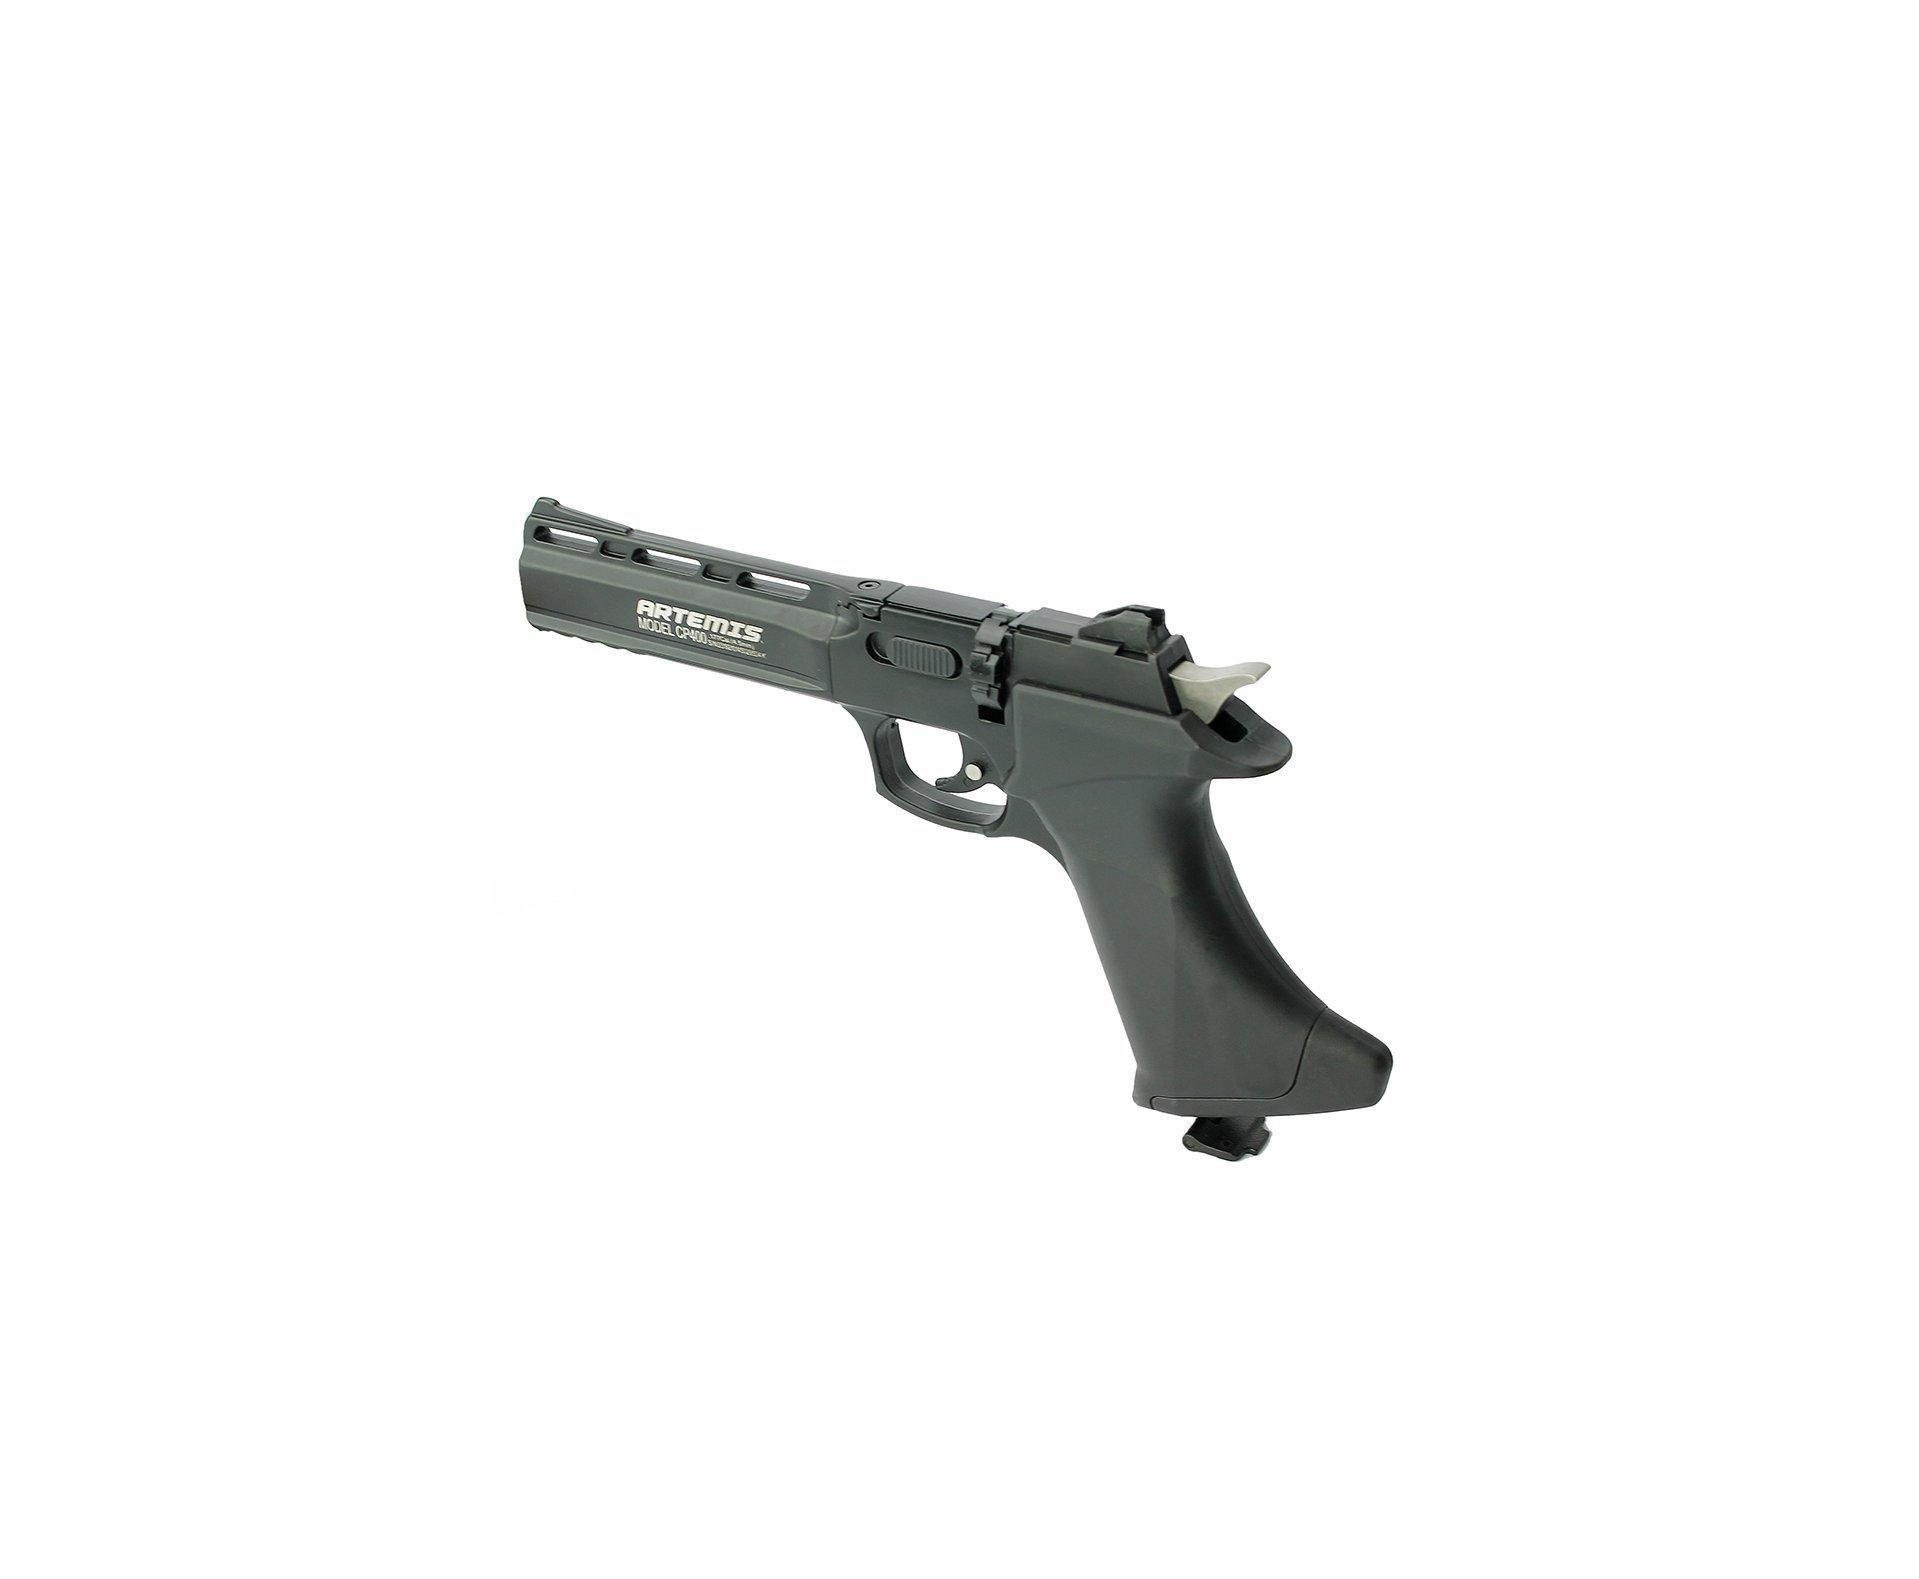 Pistola De Pressão Co2 Cp400 Orion 8 Tiros Artemis 4,5mm